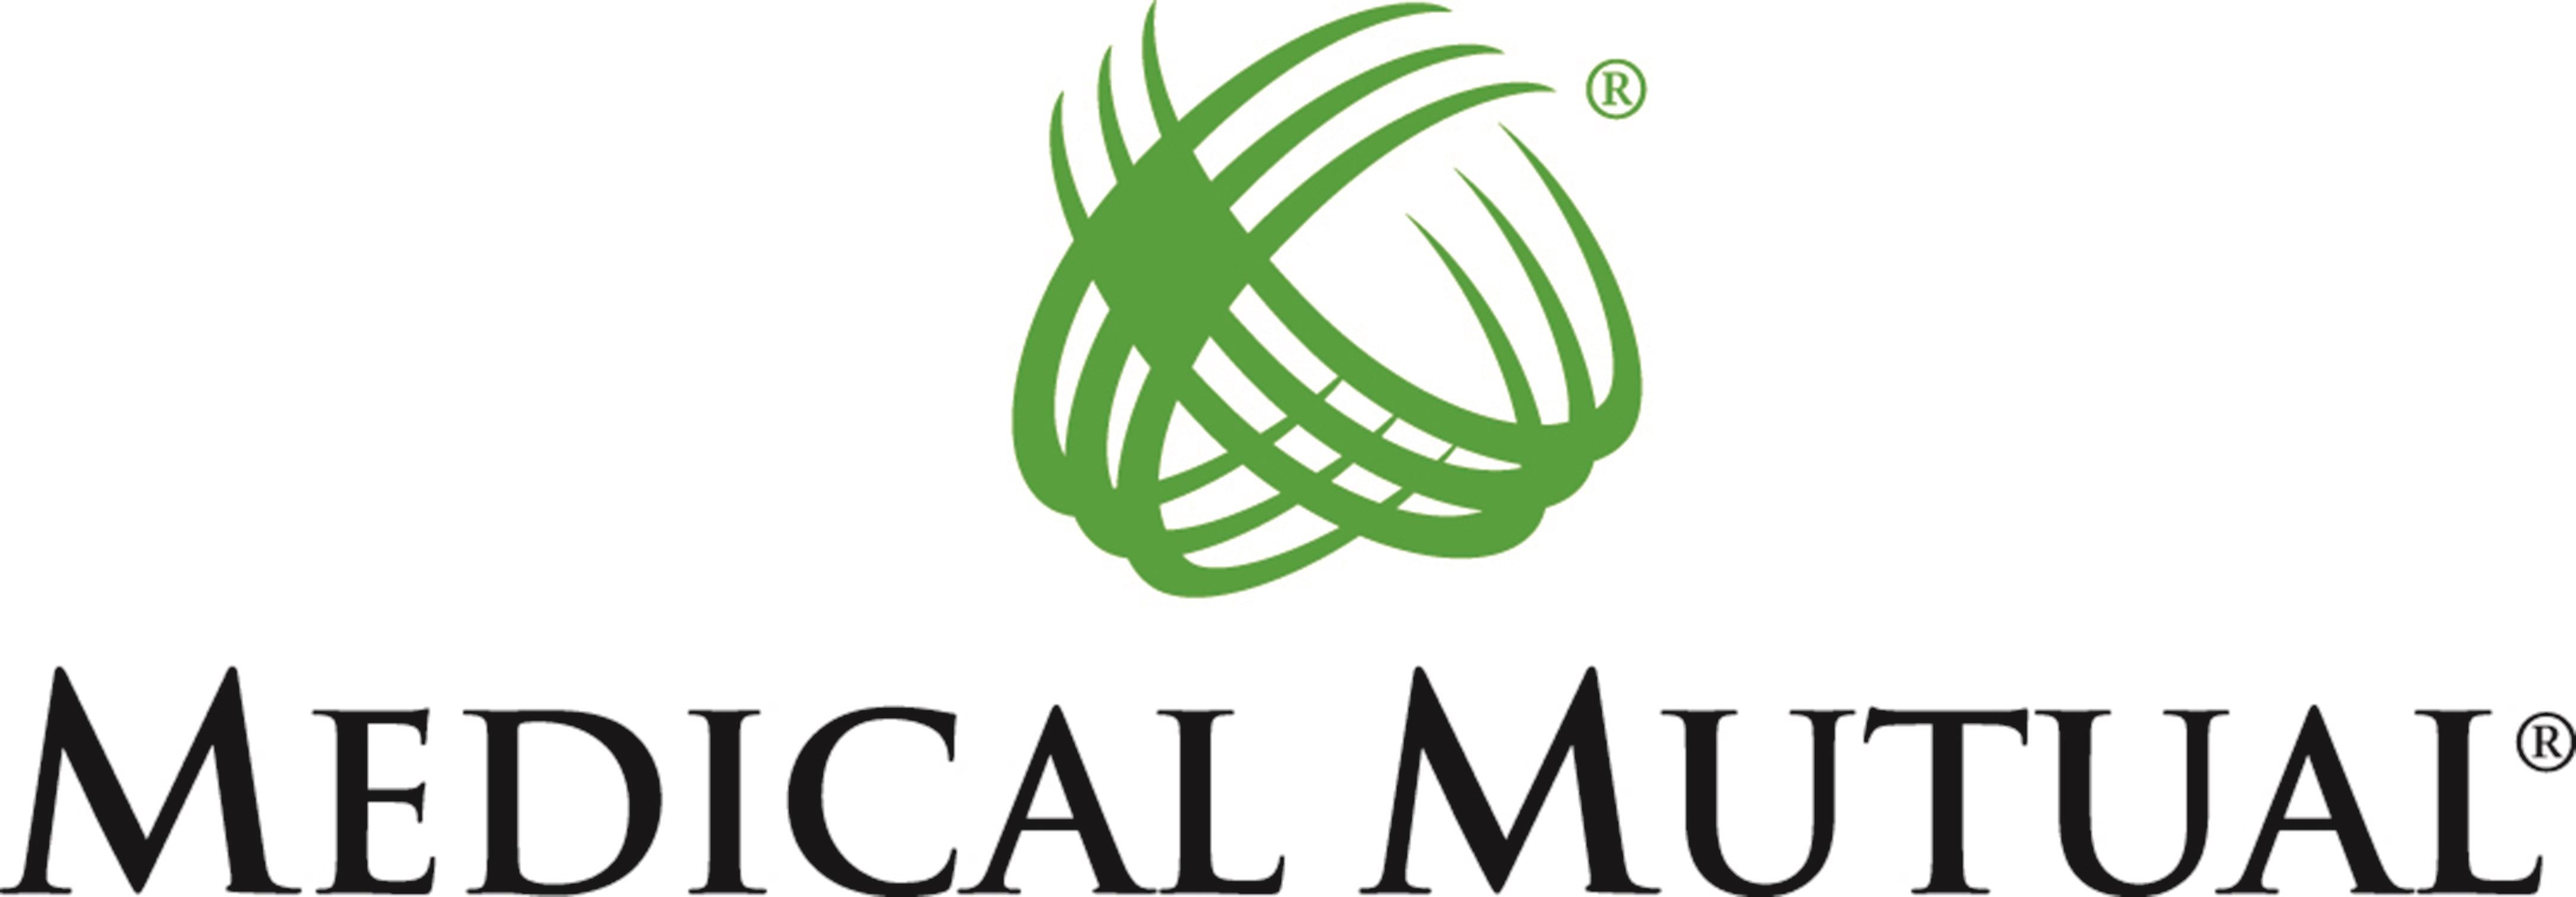 mm-logo-2016